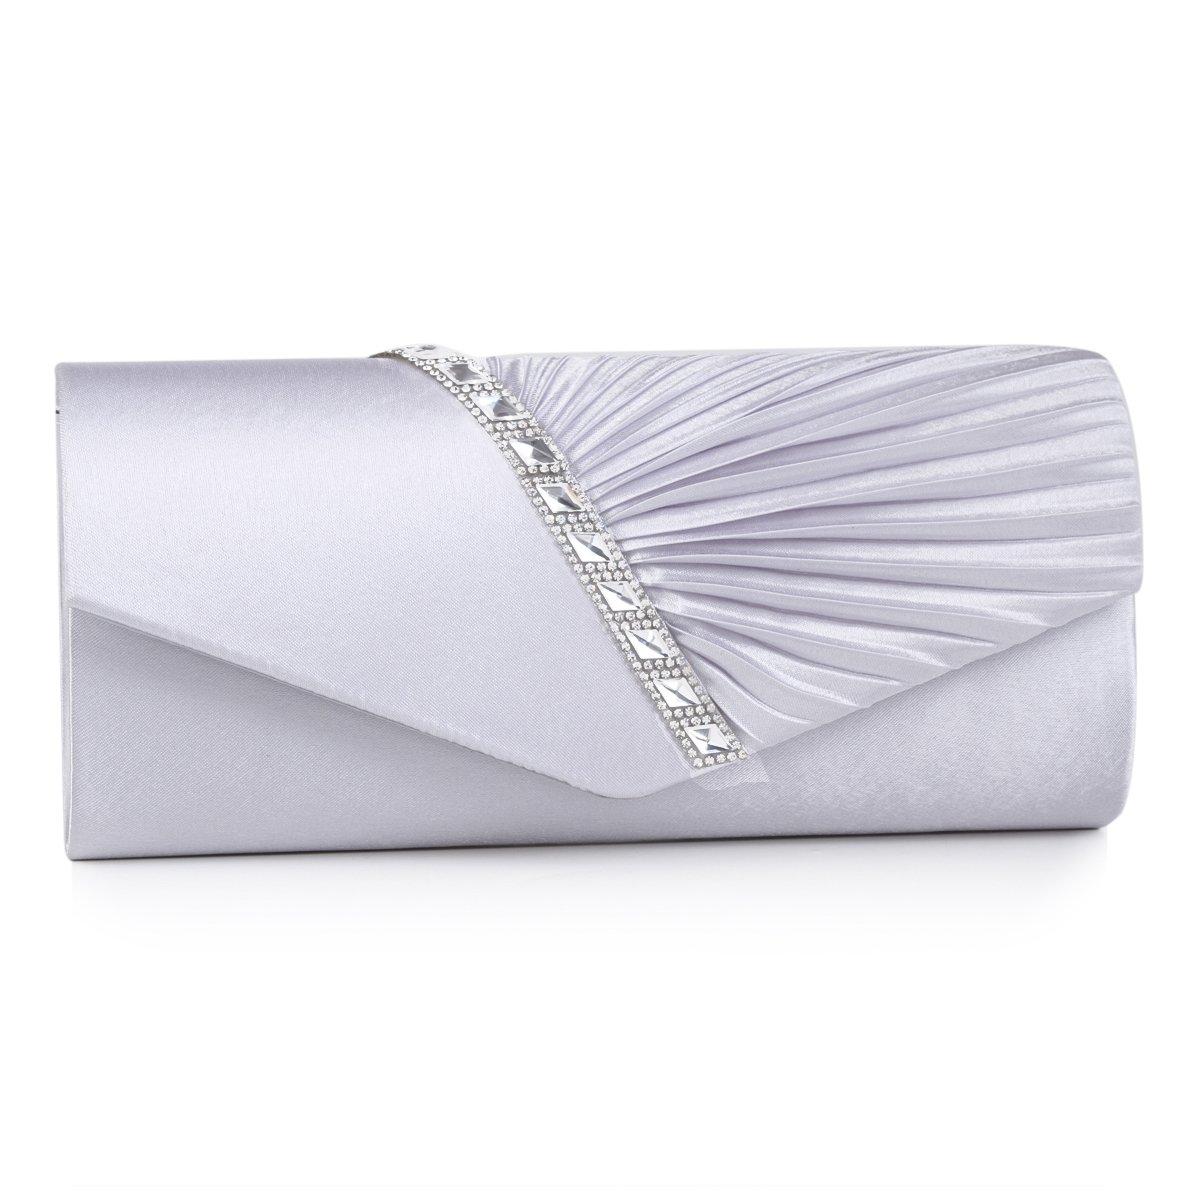 Damara Womens Pleated Crystal-Studded Satin Handbag Evening Clutch,Silver